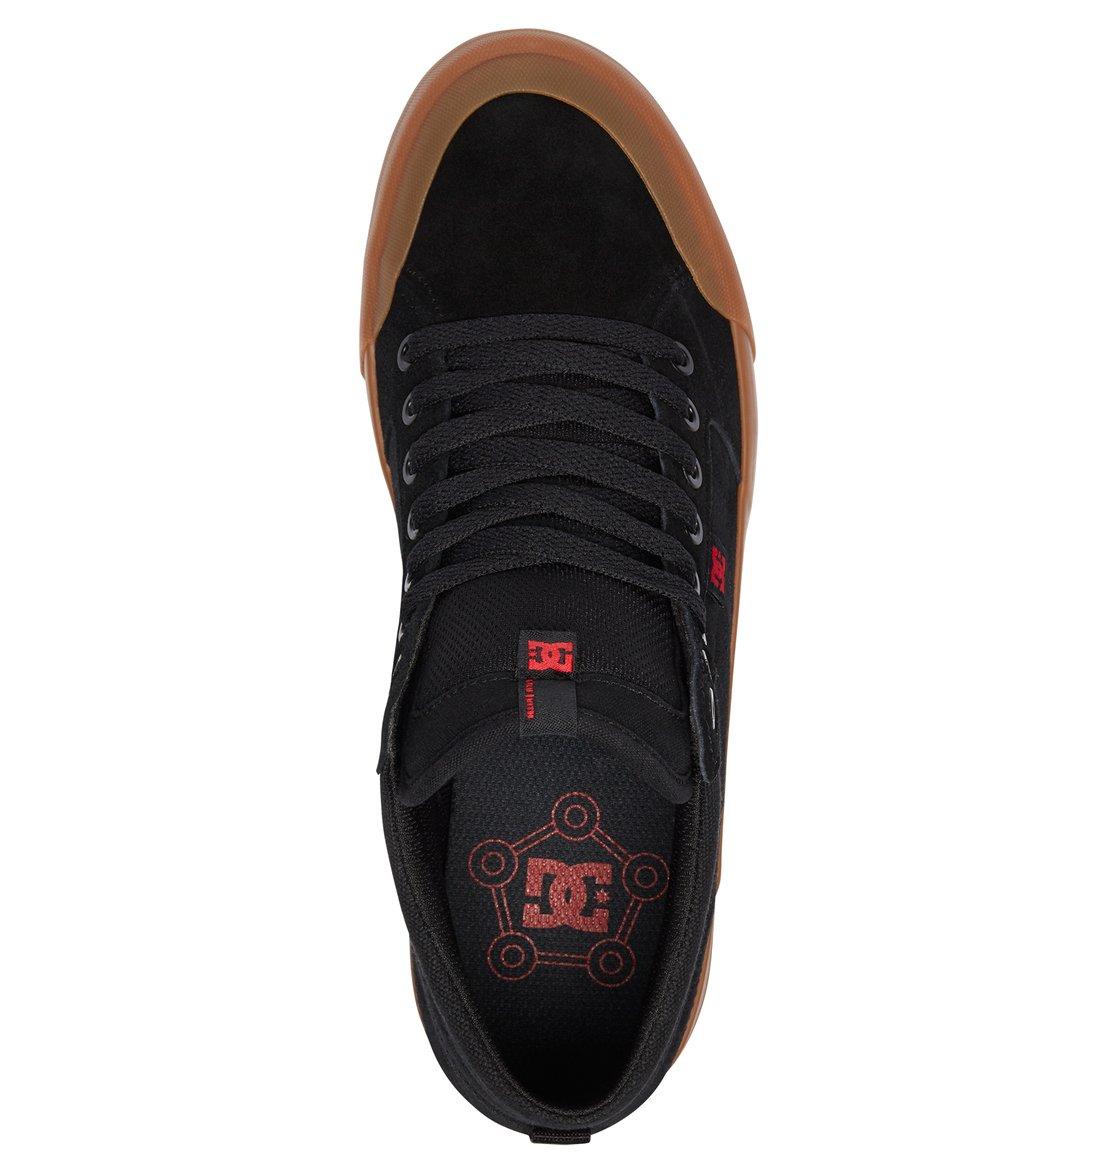 eb7a9cbb095 3 of 5 DC Shoes™ Men s Evan Smith Hi S High Top Skate Shoes ADYS300380